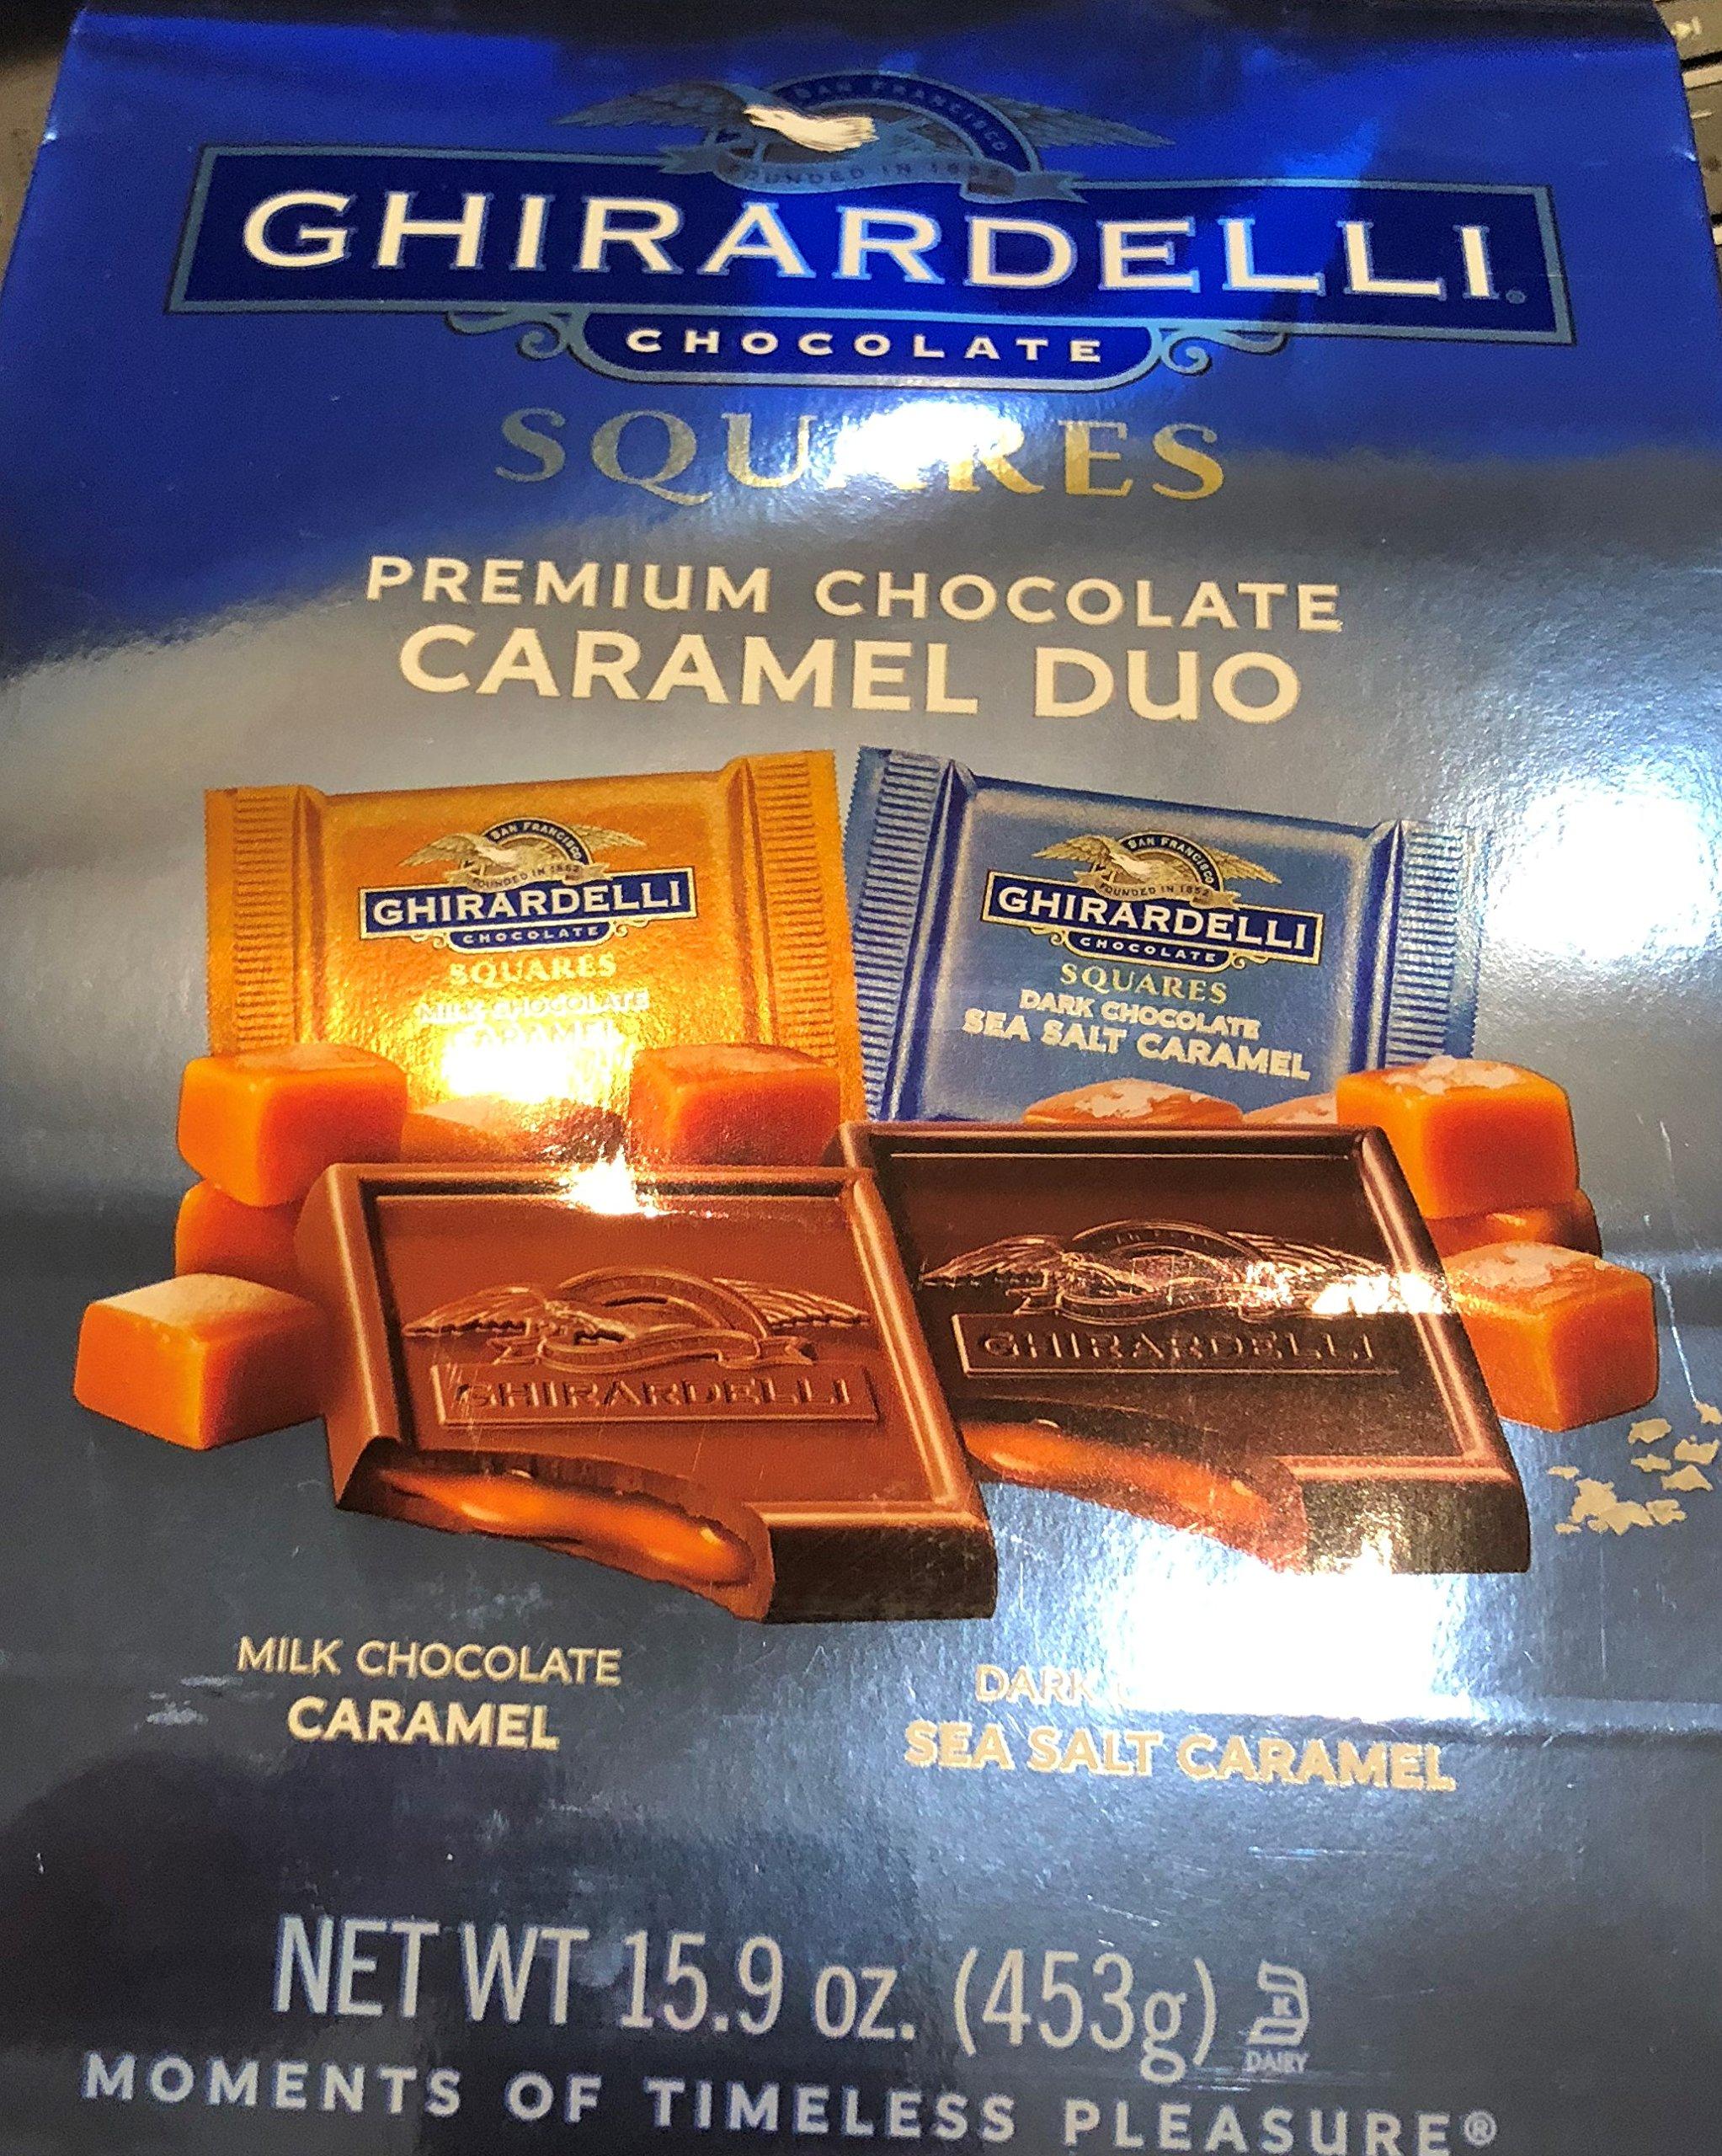 Ghirardelli Premium Chocolate Caramel Duo XL Bags 15.9 oz!